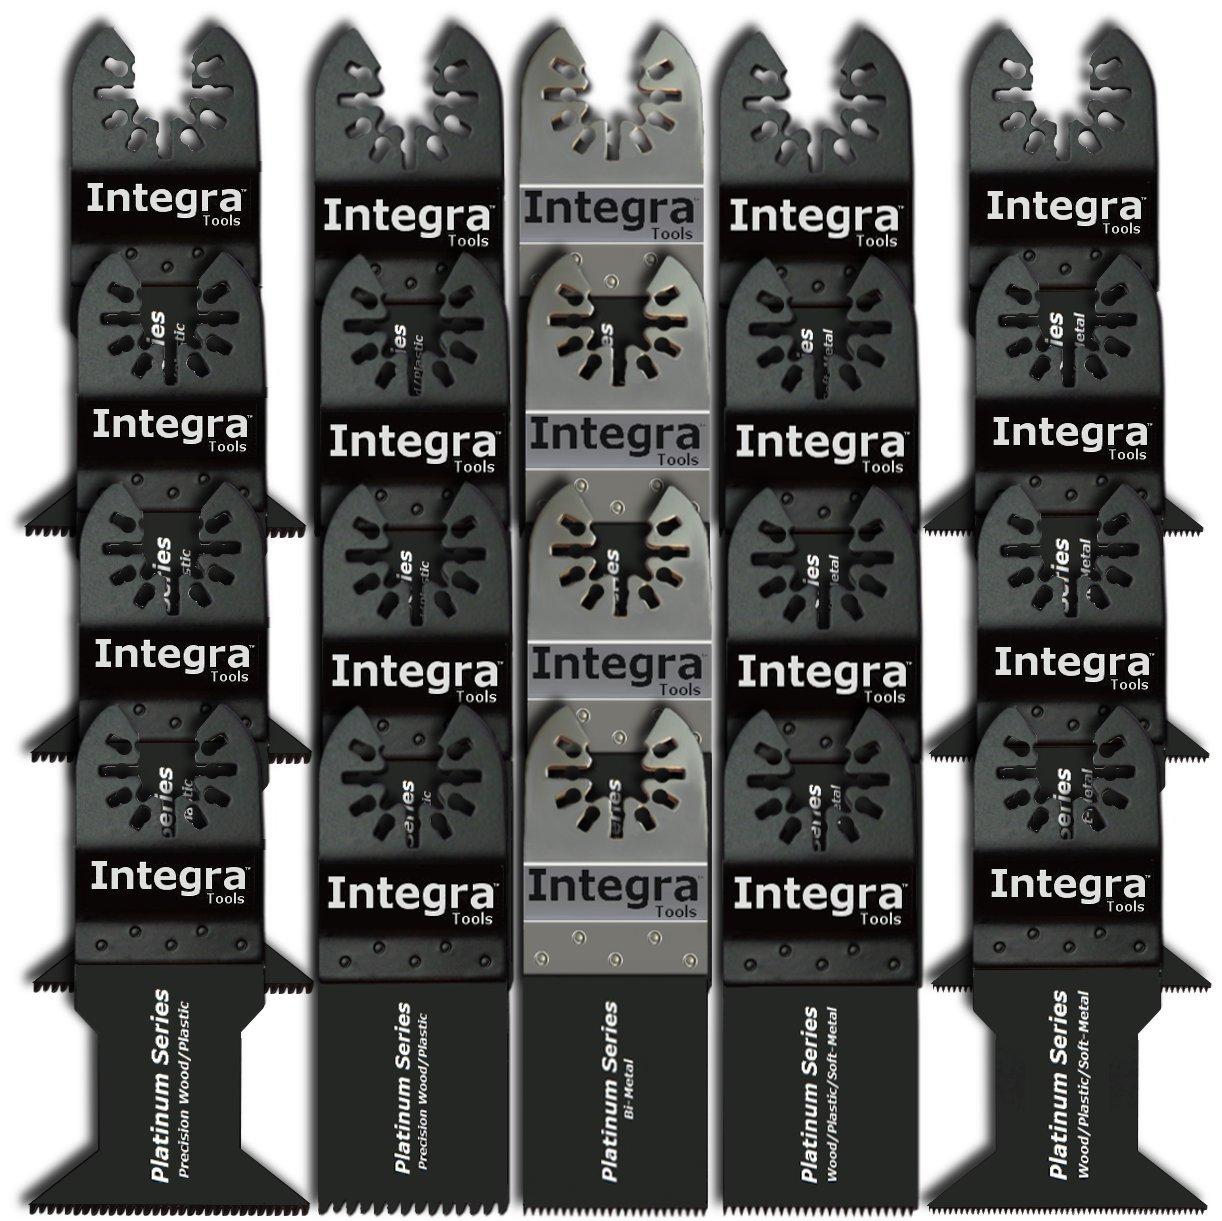 INTEGRA 20pc Mix Saw Wood Bi-metal Precision Pack Oscillating Multitool Quick Release Saw Blade Fit Fein Multimaster Porter Cable Black & Decker Bosch Ridgid Ryobi Milwaukee DeWalt Chicago Craftsman